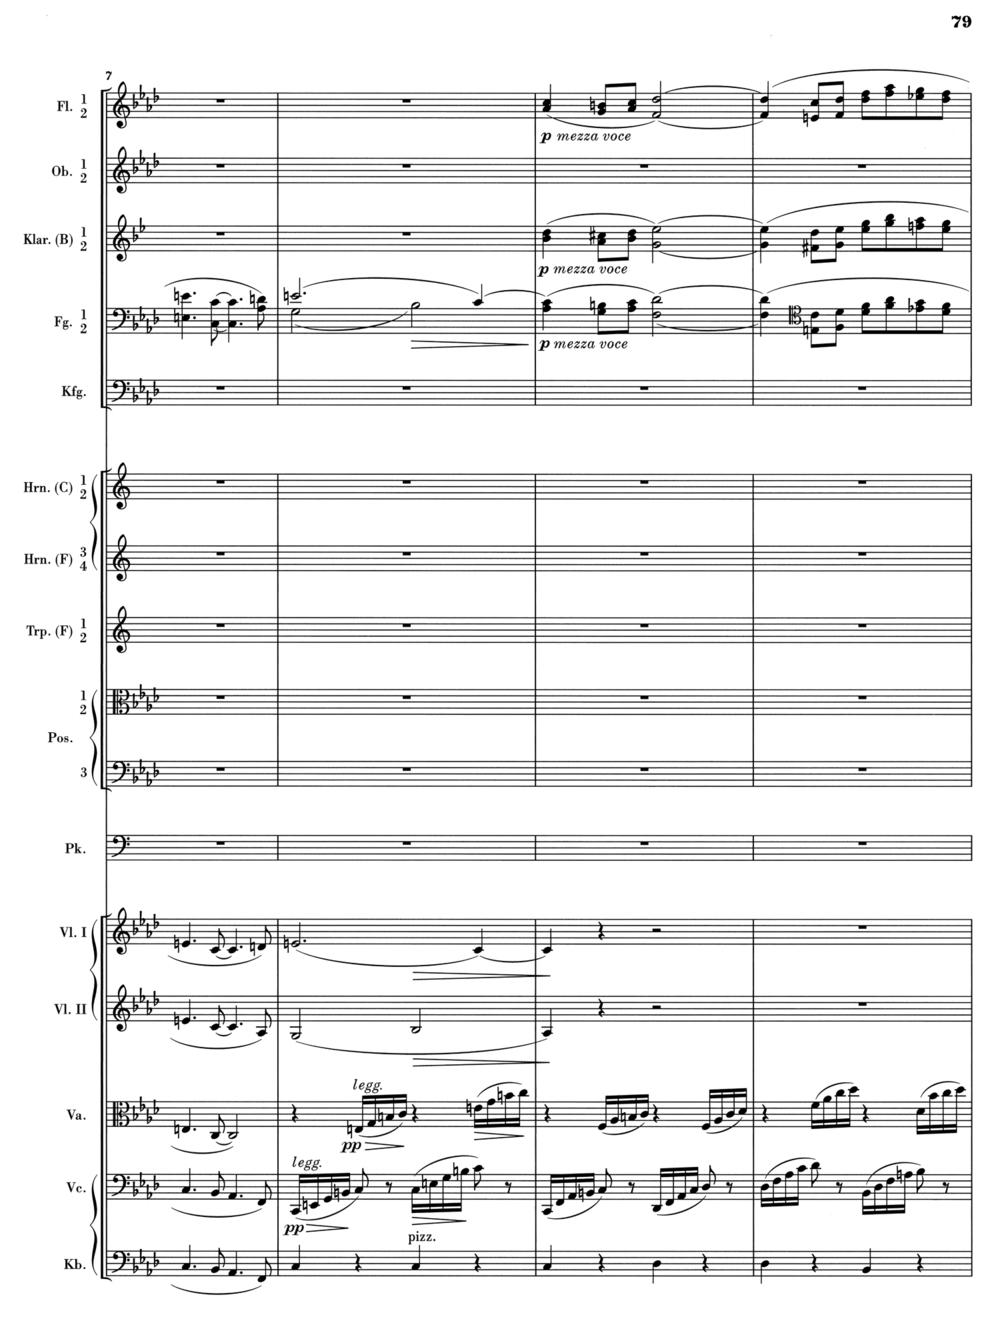 Brahms 3 Score 8.jpg